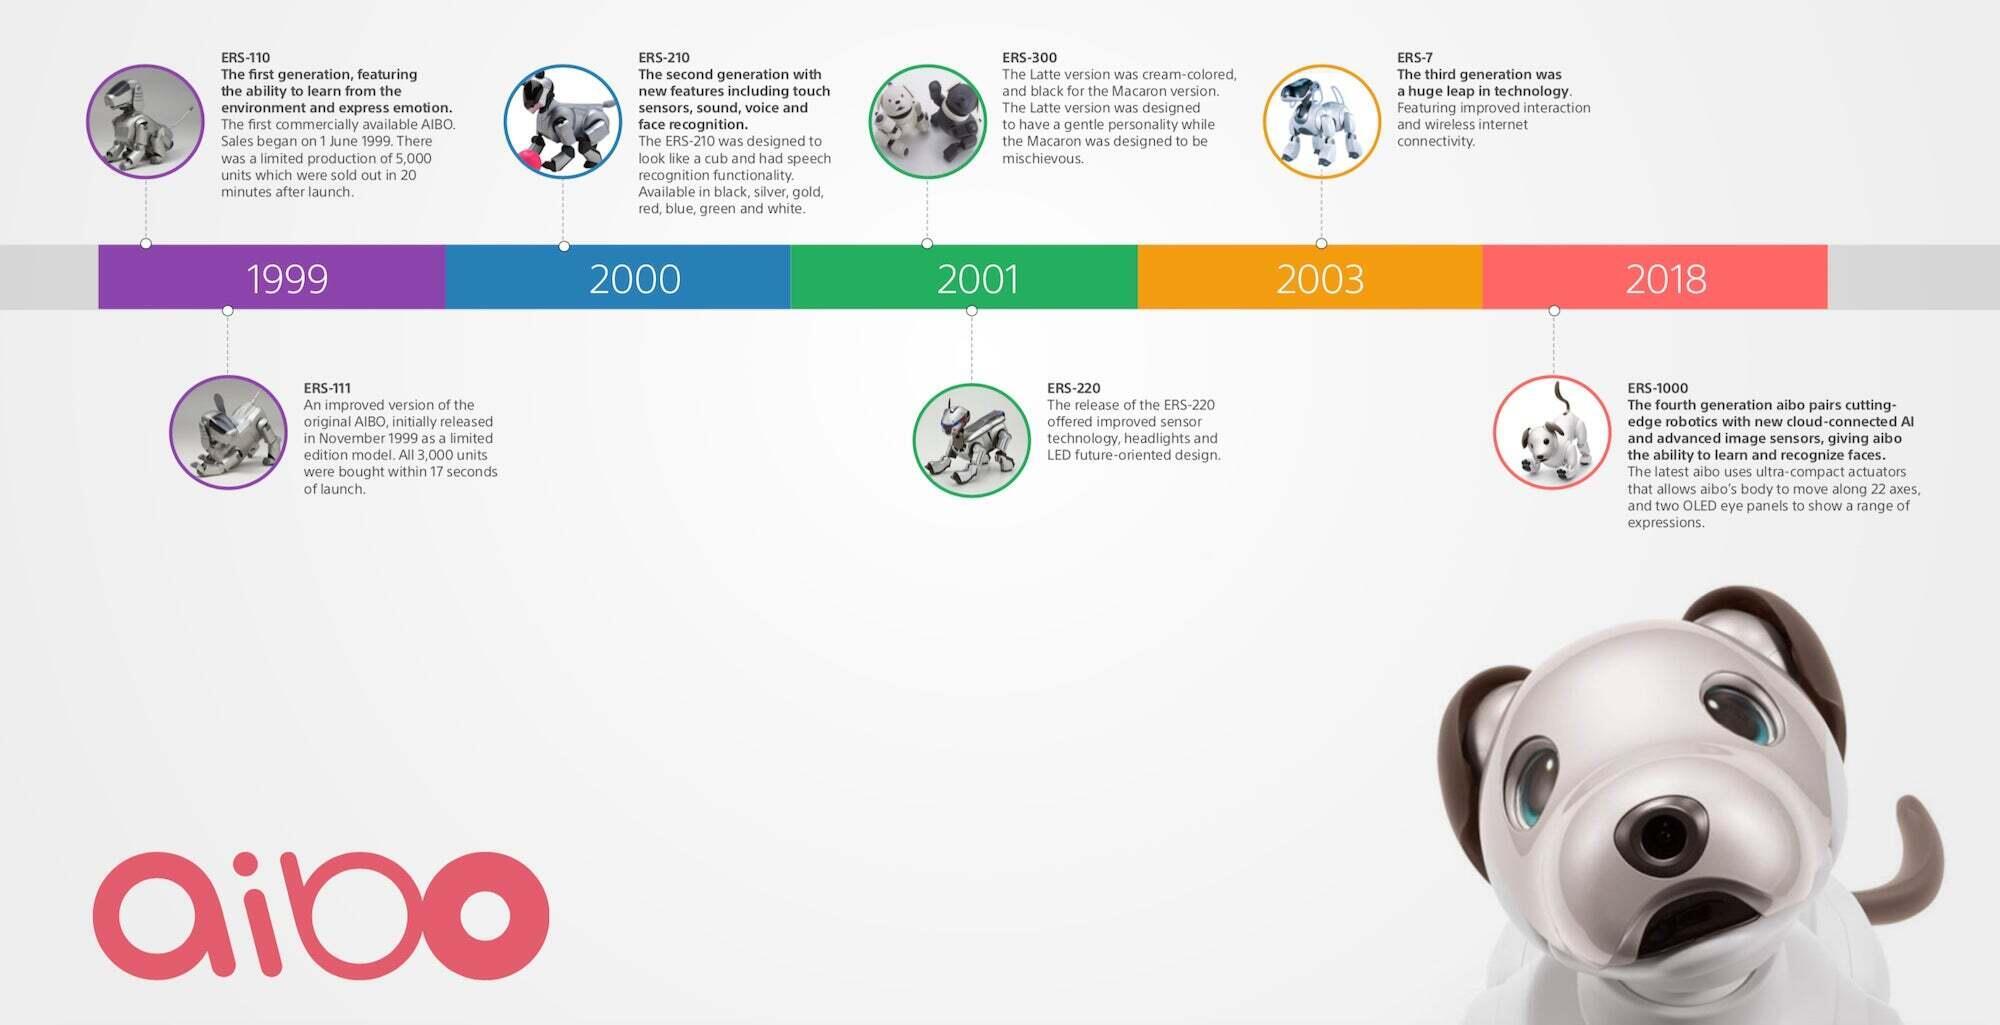 Sony-aibo-evolution-timeline-1.jpg